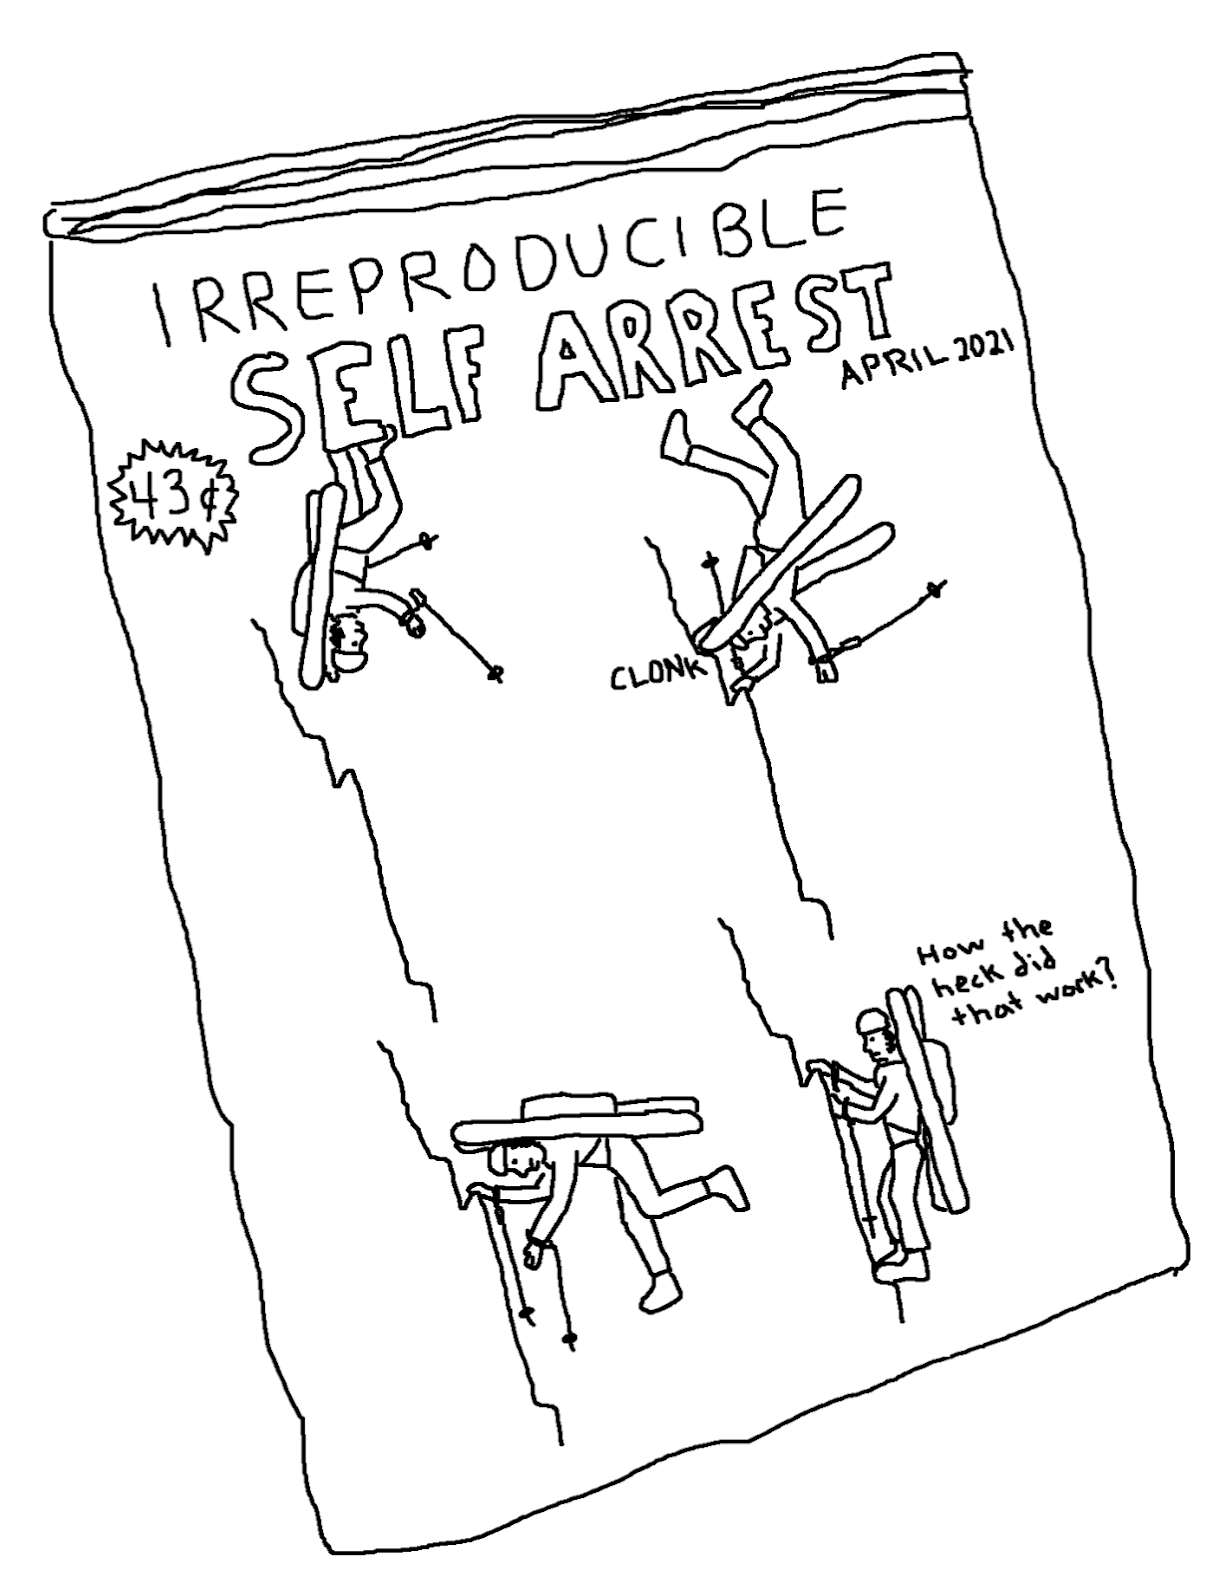 Irreproducible Self-Arrest Monthly